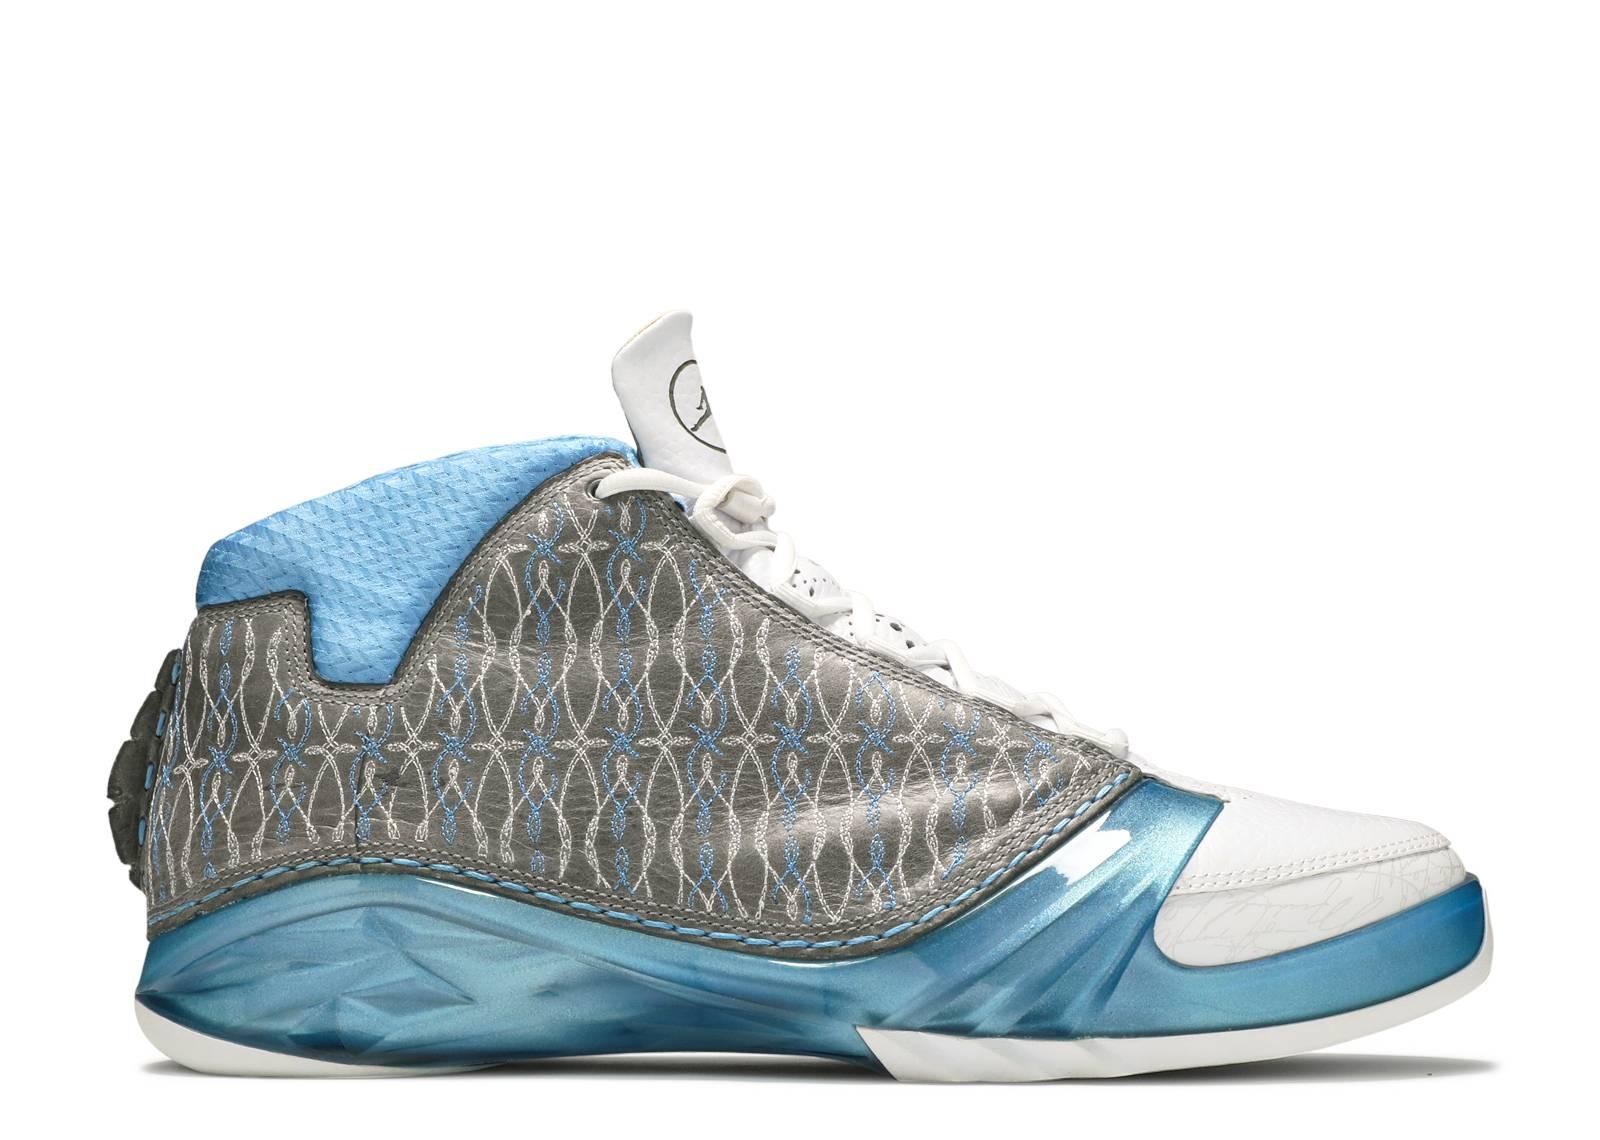 b2d7c89017cb23 Air Jordan 23 (XXIII) Shoes - Nike